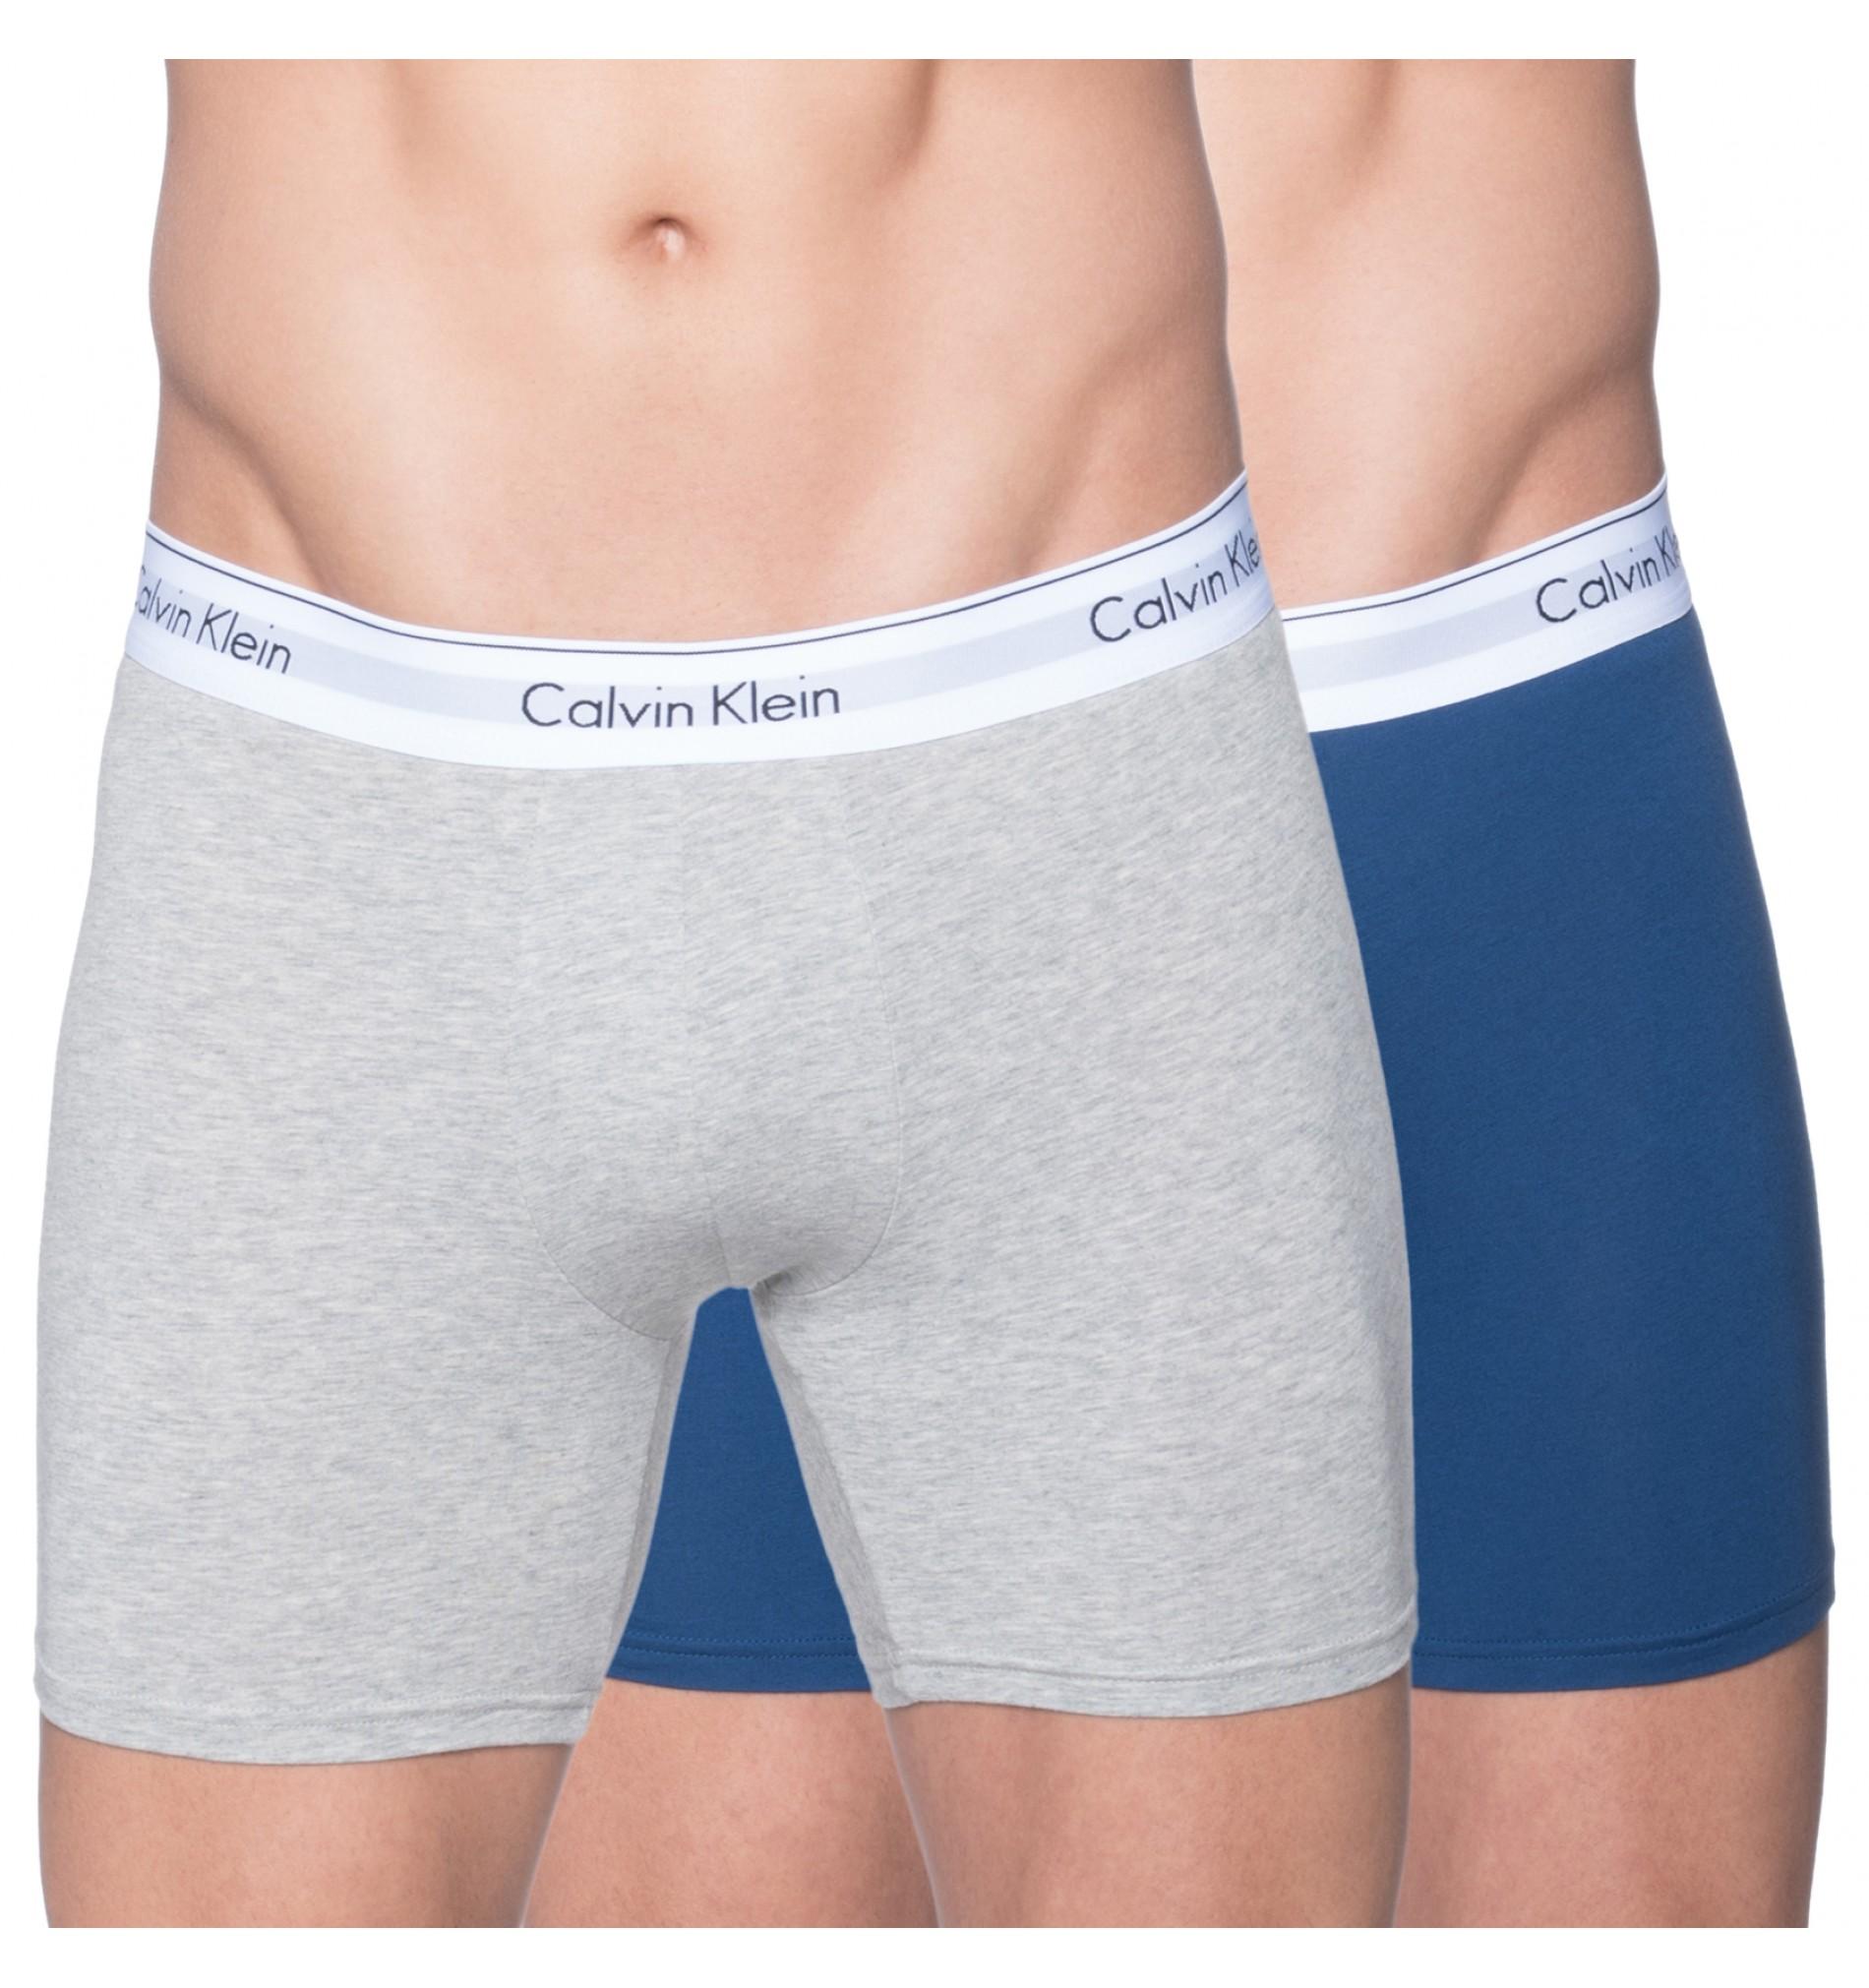 boxerky s predlženým strihom - 2PACK 'MODERN COTTON' modrá,sivá  YTQ